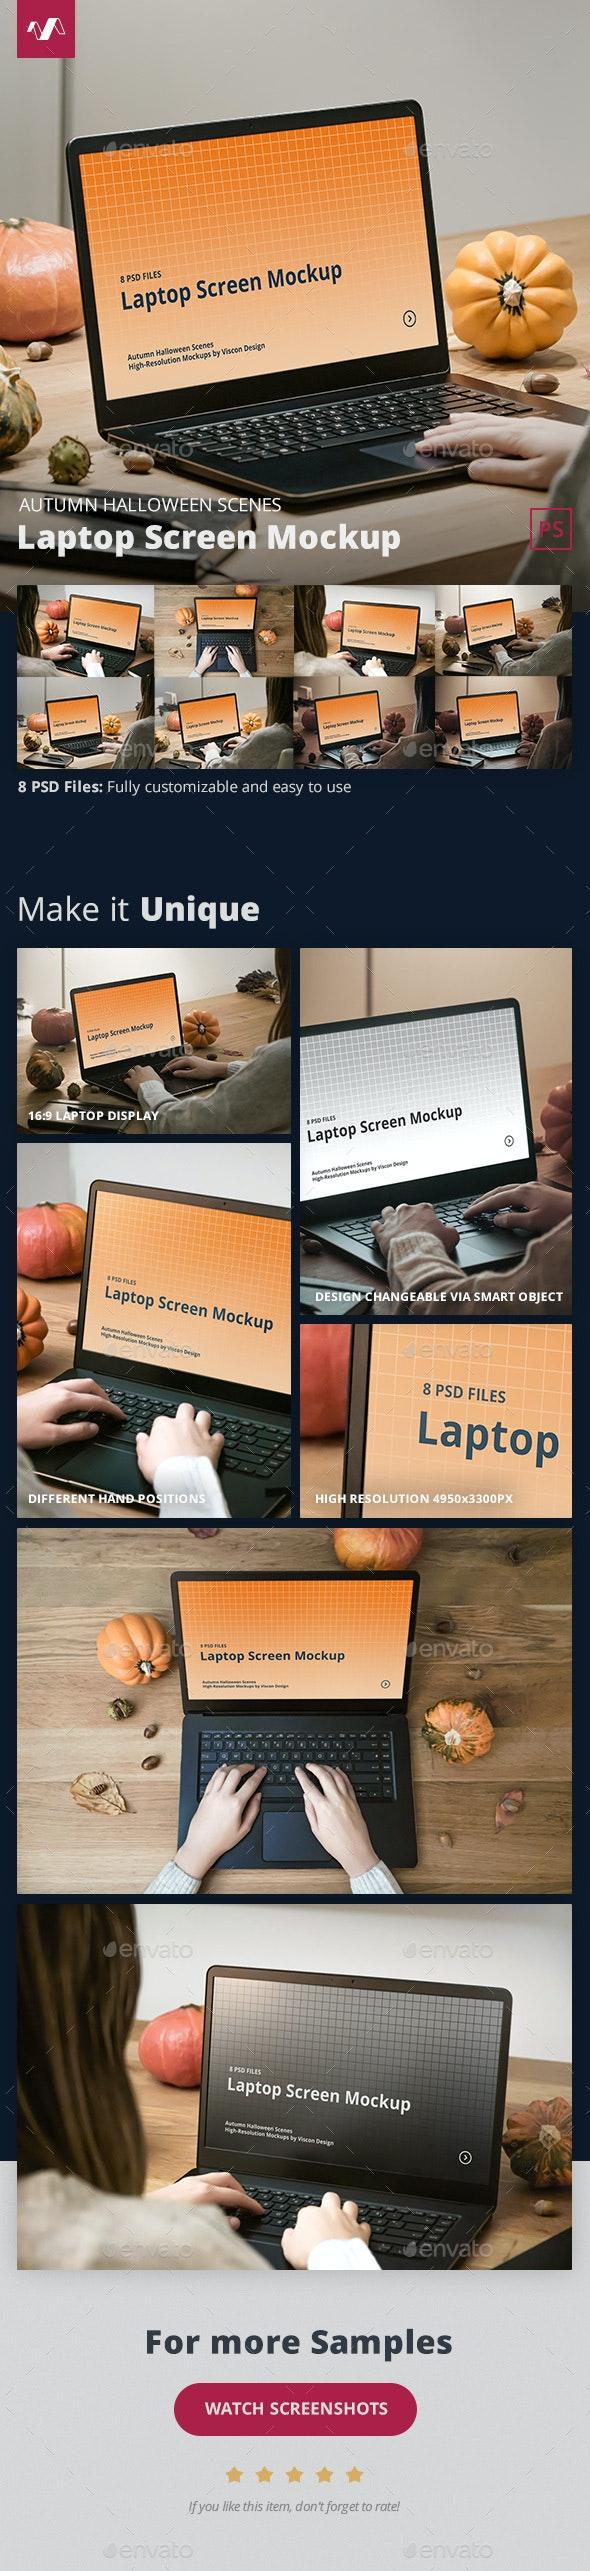 Laptop Mockup Autumn Halloween Scenes - Laptop Displays